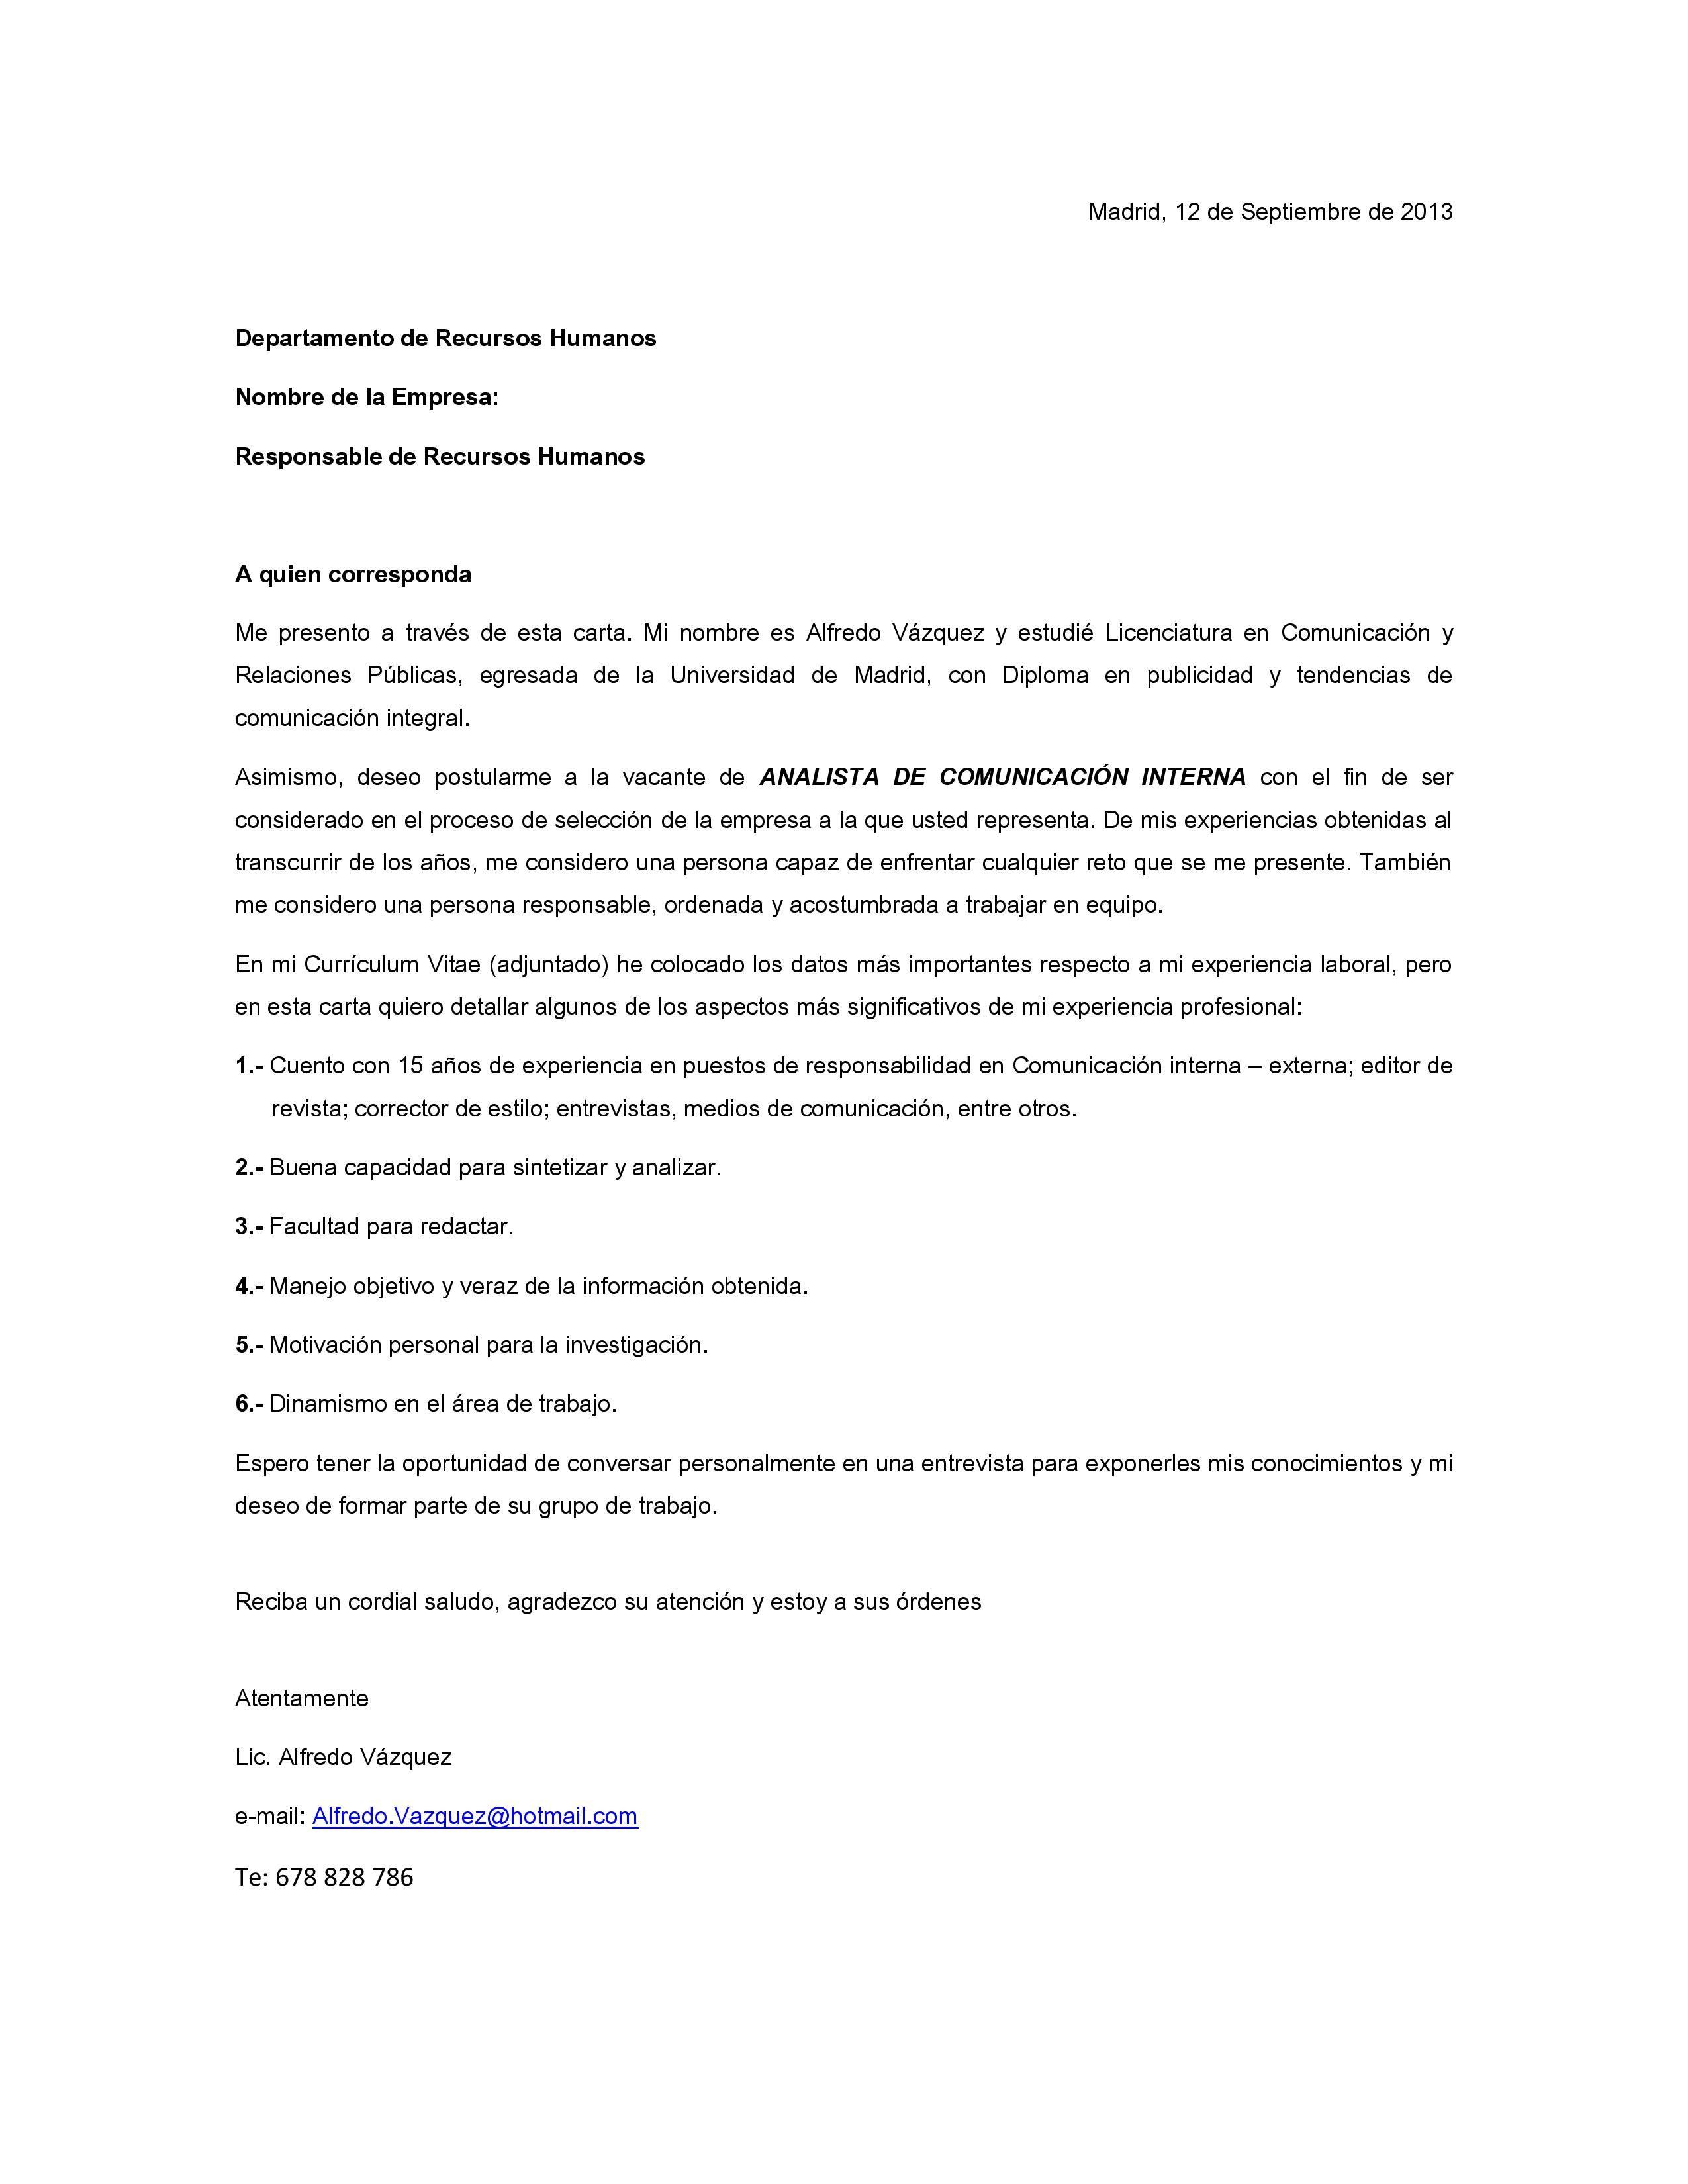 Modelo 1 De Carta De Presentacion Cartas De Presentación Del Currículum Carta De Presentacion Laboral Carta De Motivacion Laboral